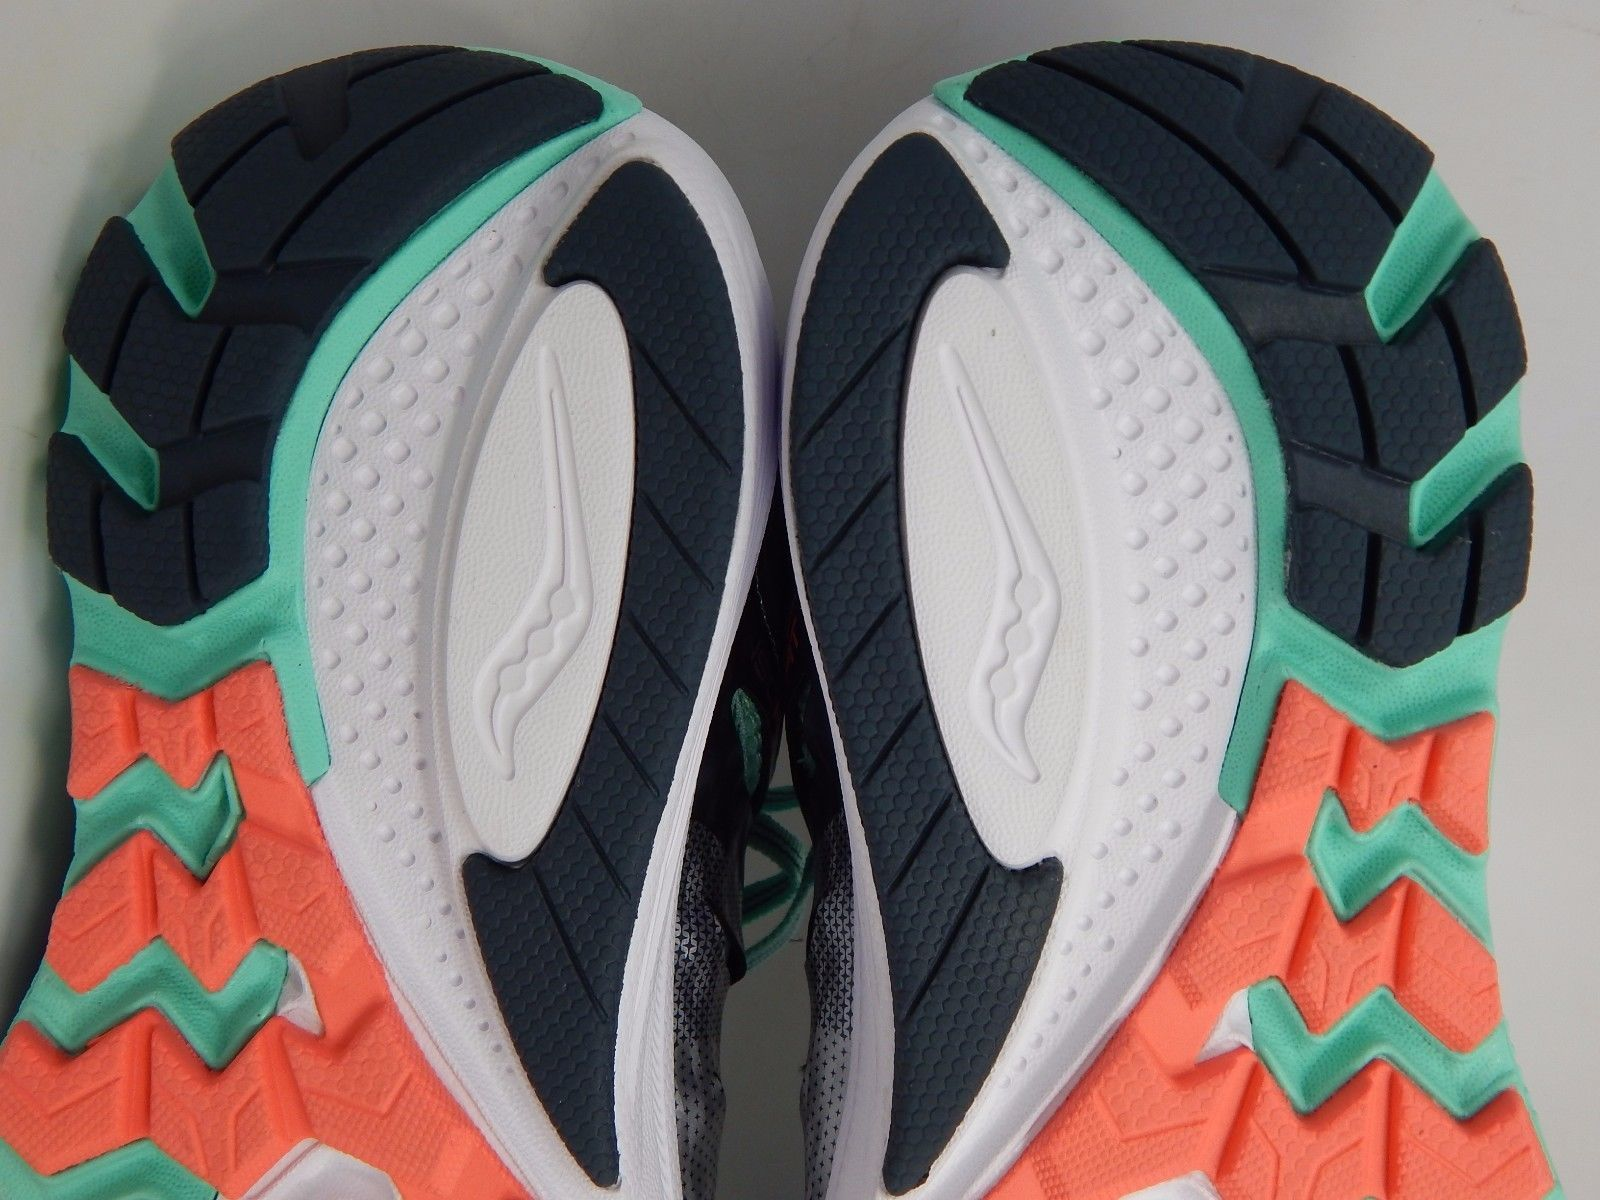 Saucony Zealot ISO 2 Women's Running Shoes Size US 8.5 M (B) EU 40 S10314-1